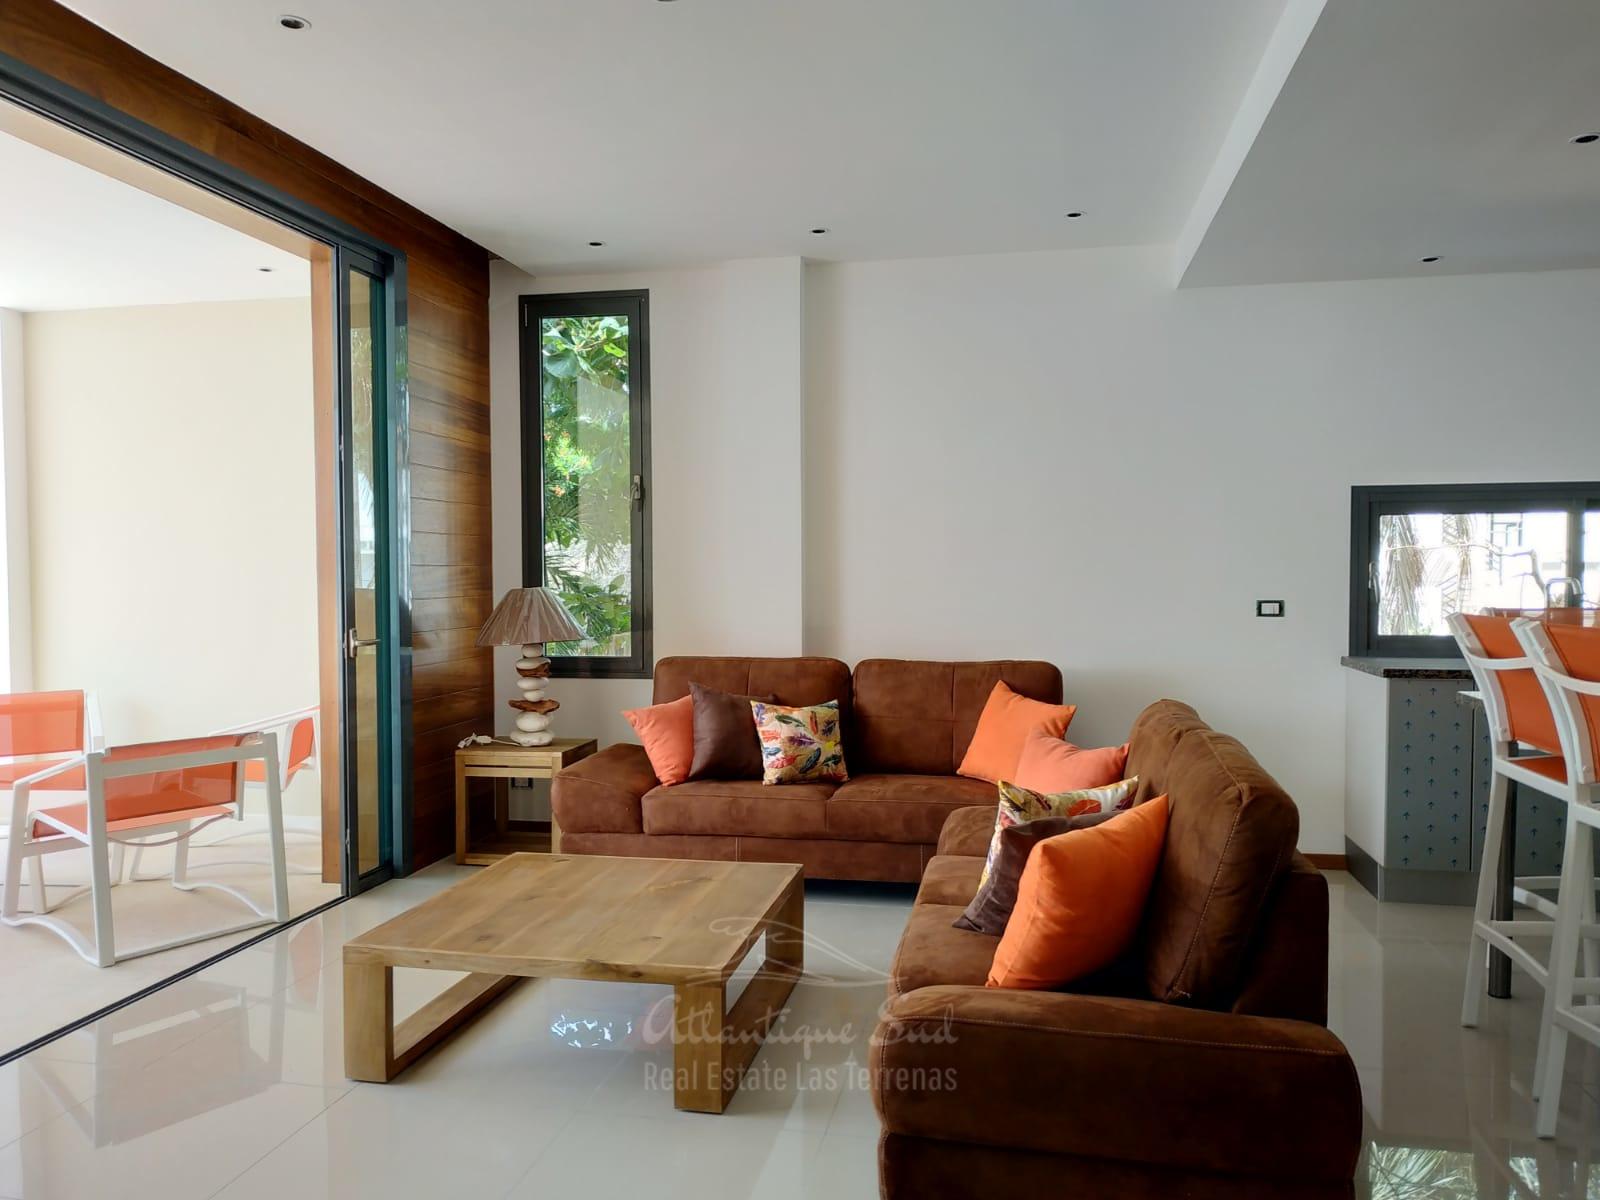 apartment for sale las terrenas beachfront condo7.jpg